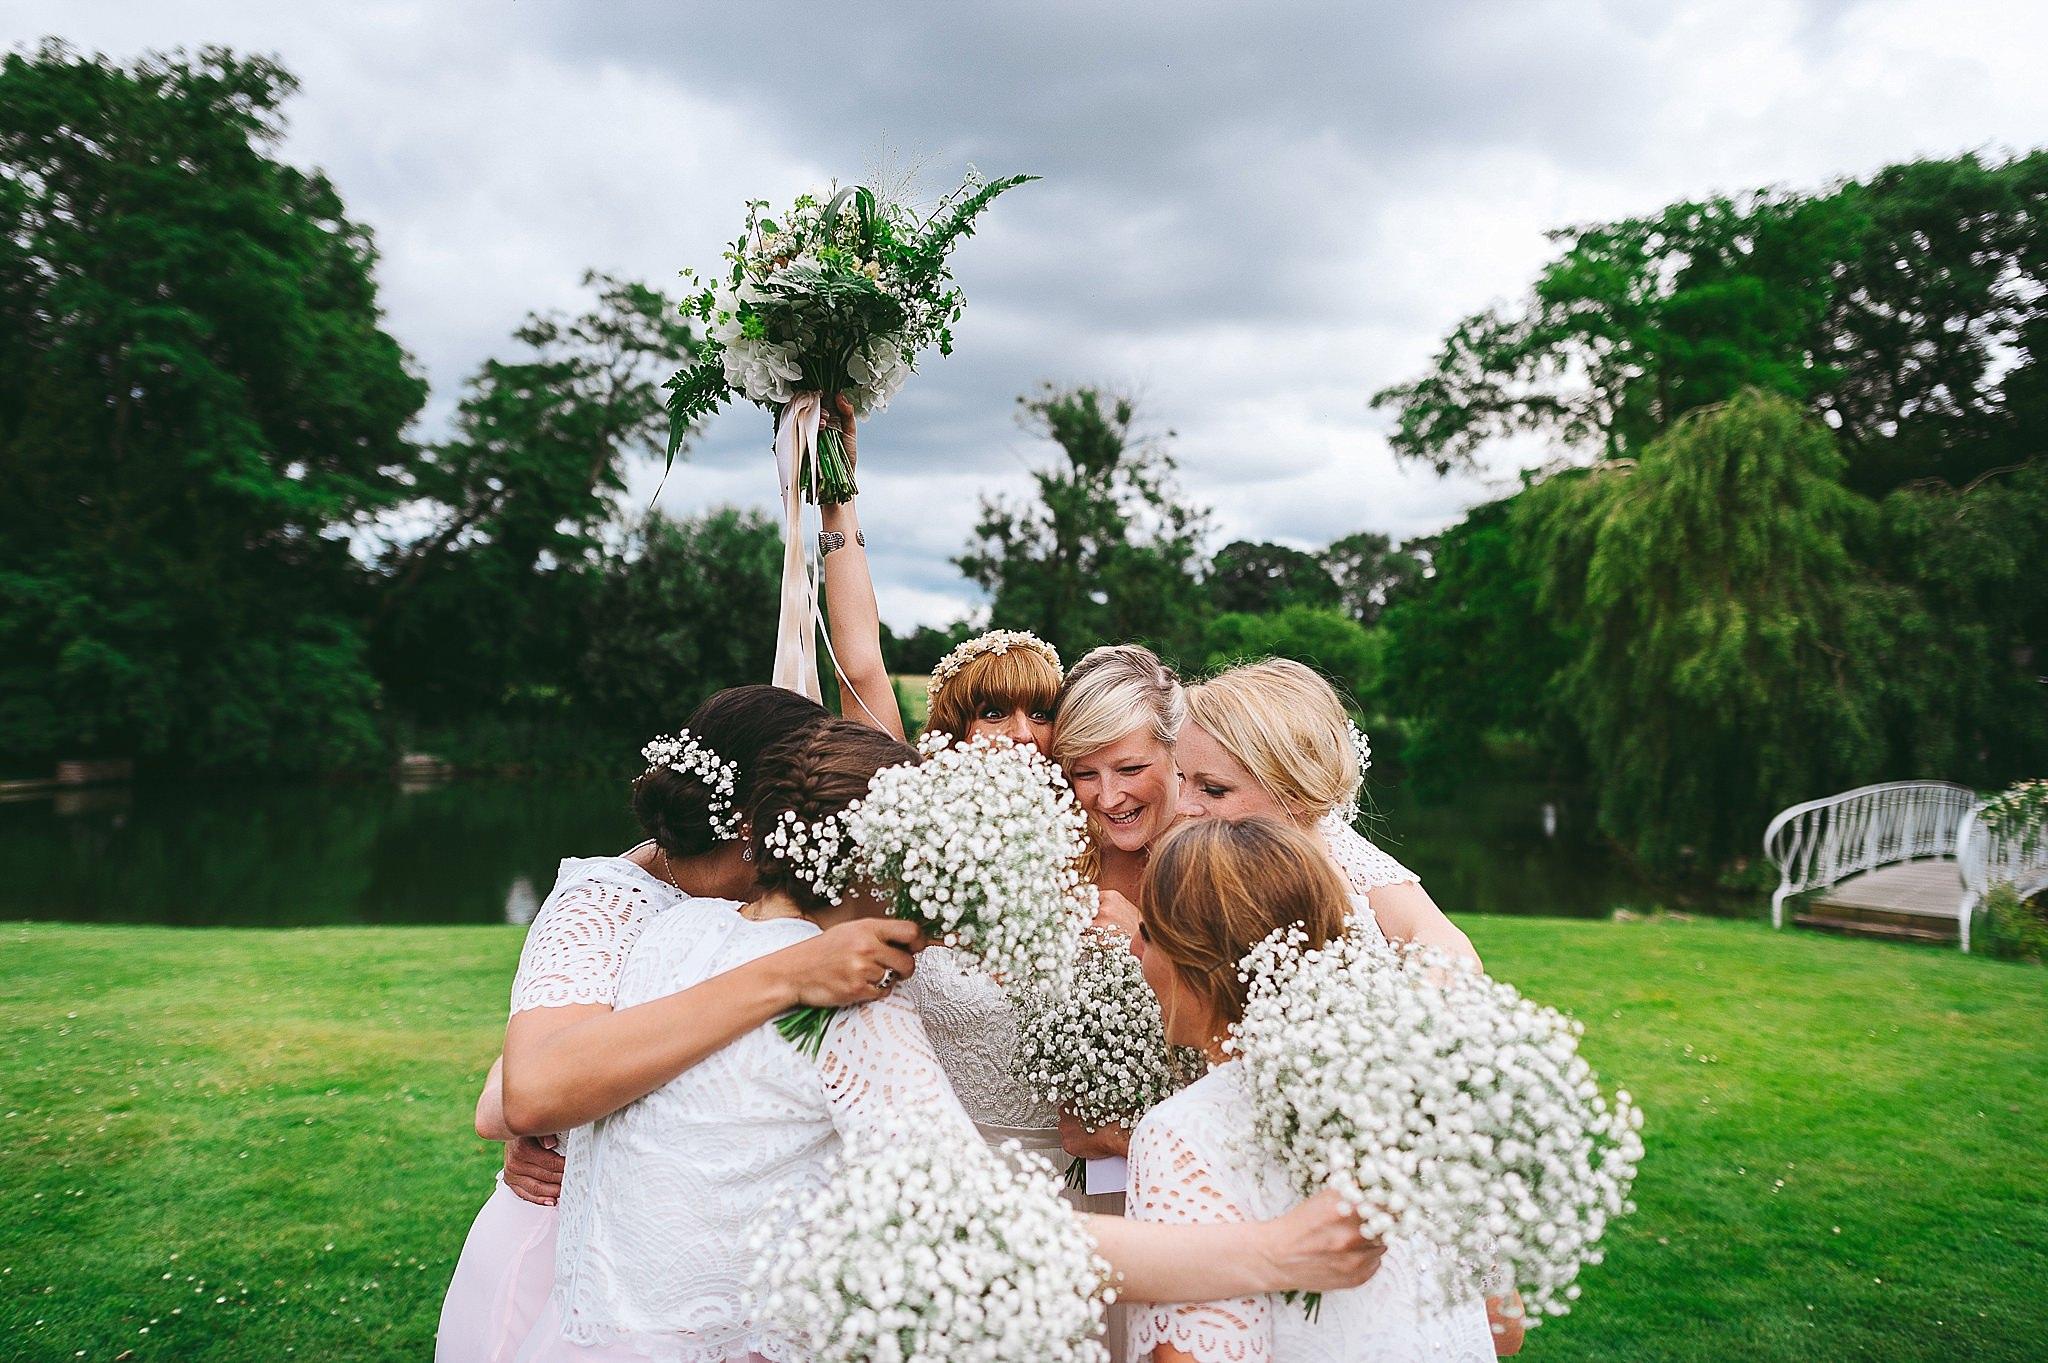 aga-tomaszek-wedding-photographer-cardiff-2016_1100